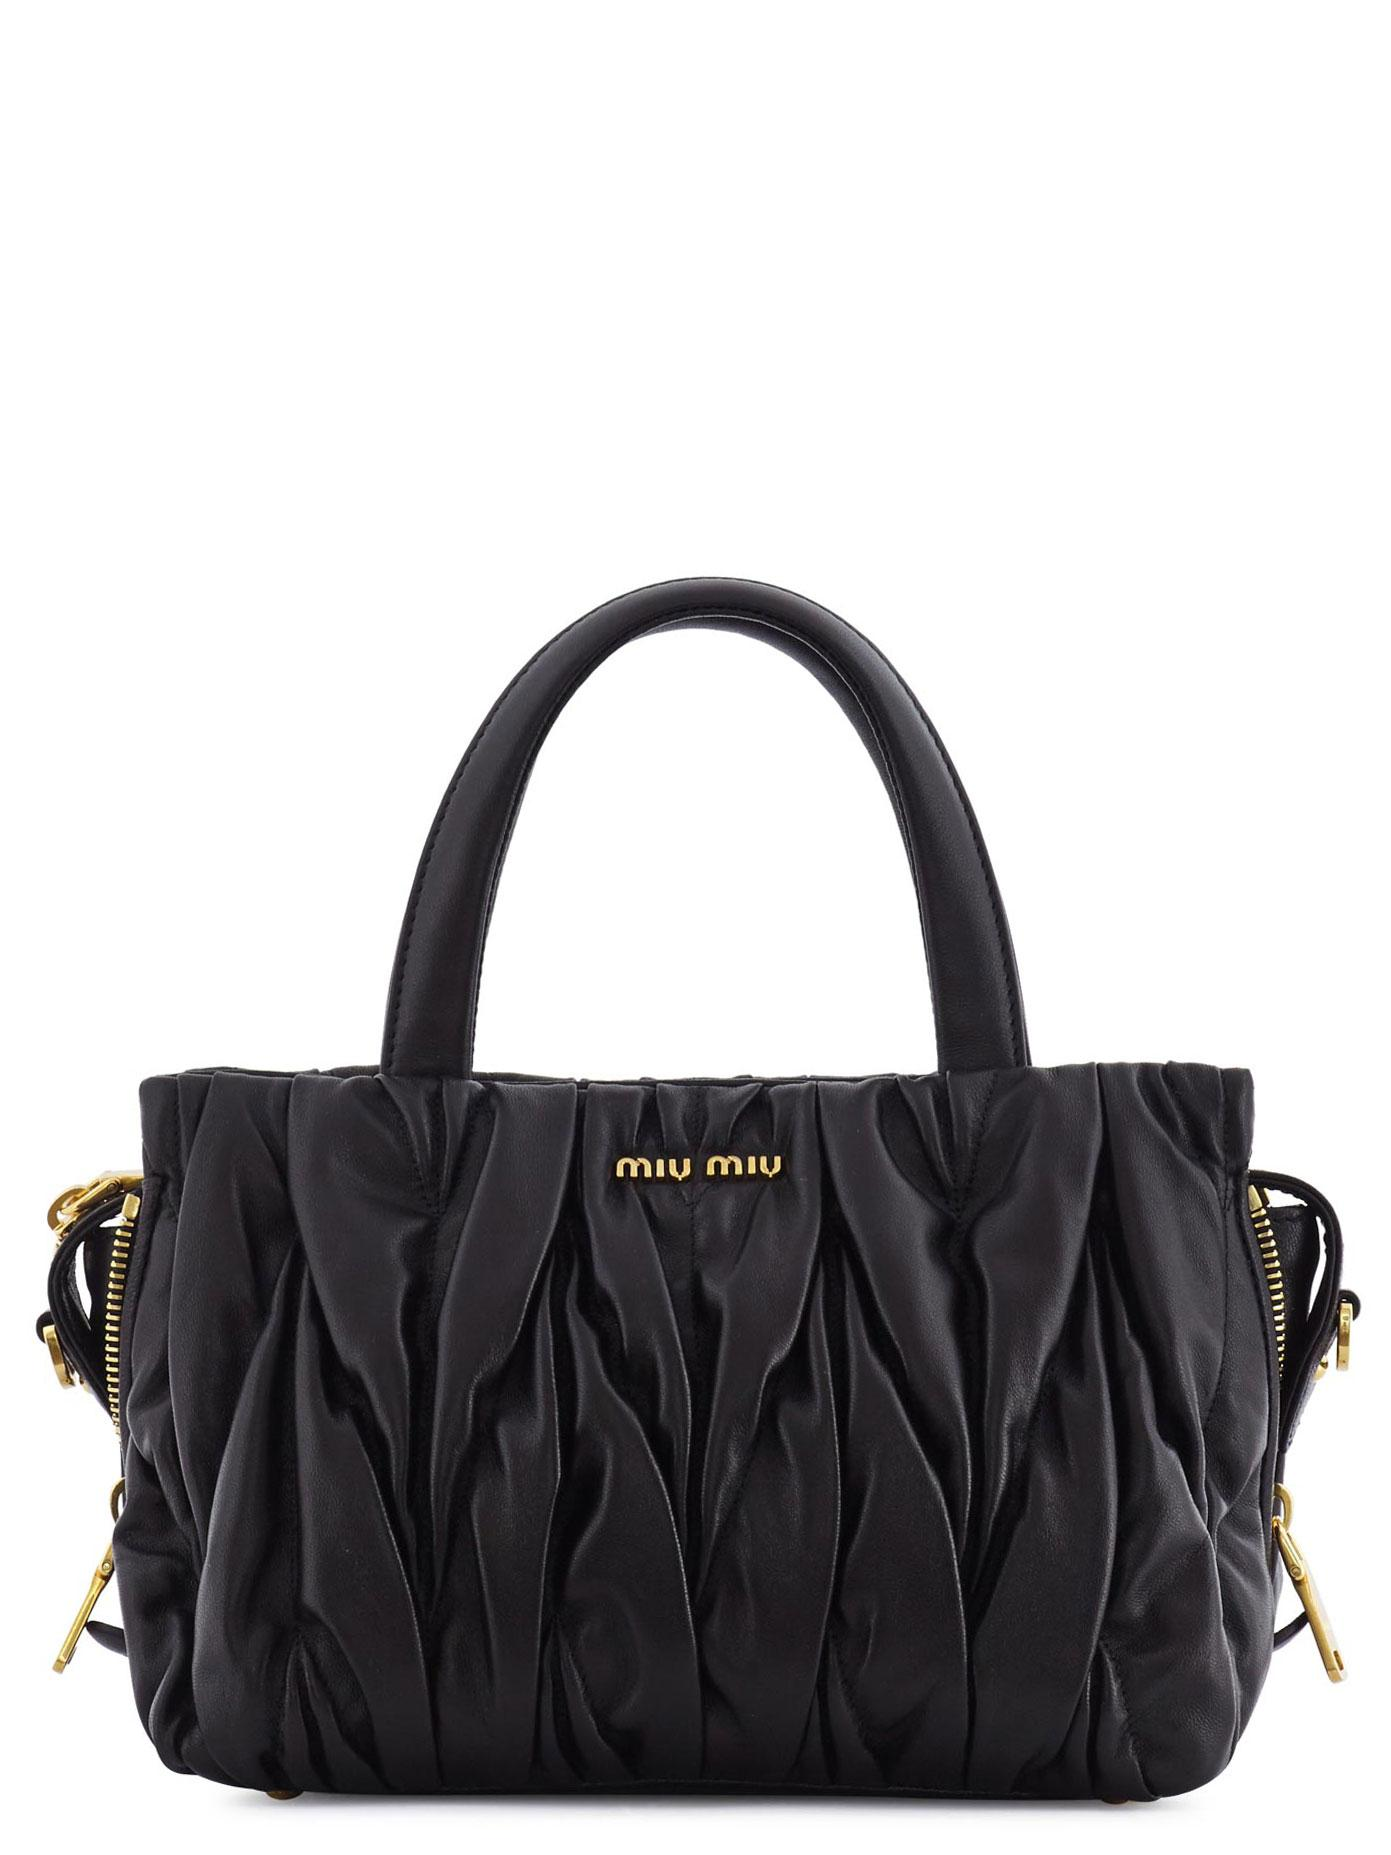 20f46788b0a3 Miu Miu Small Matelassé Tote Bag in Black - Lyst